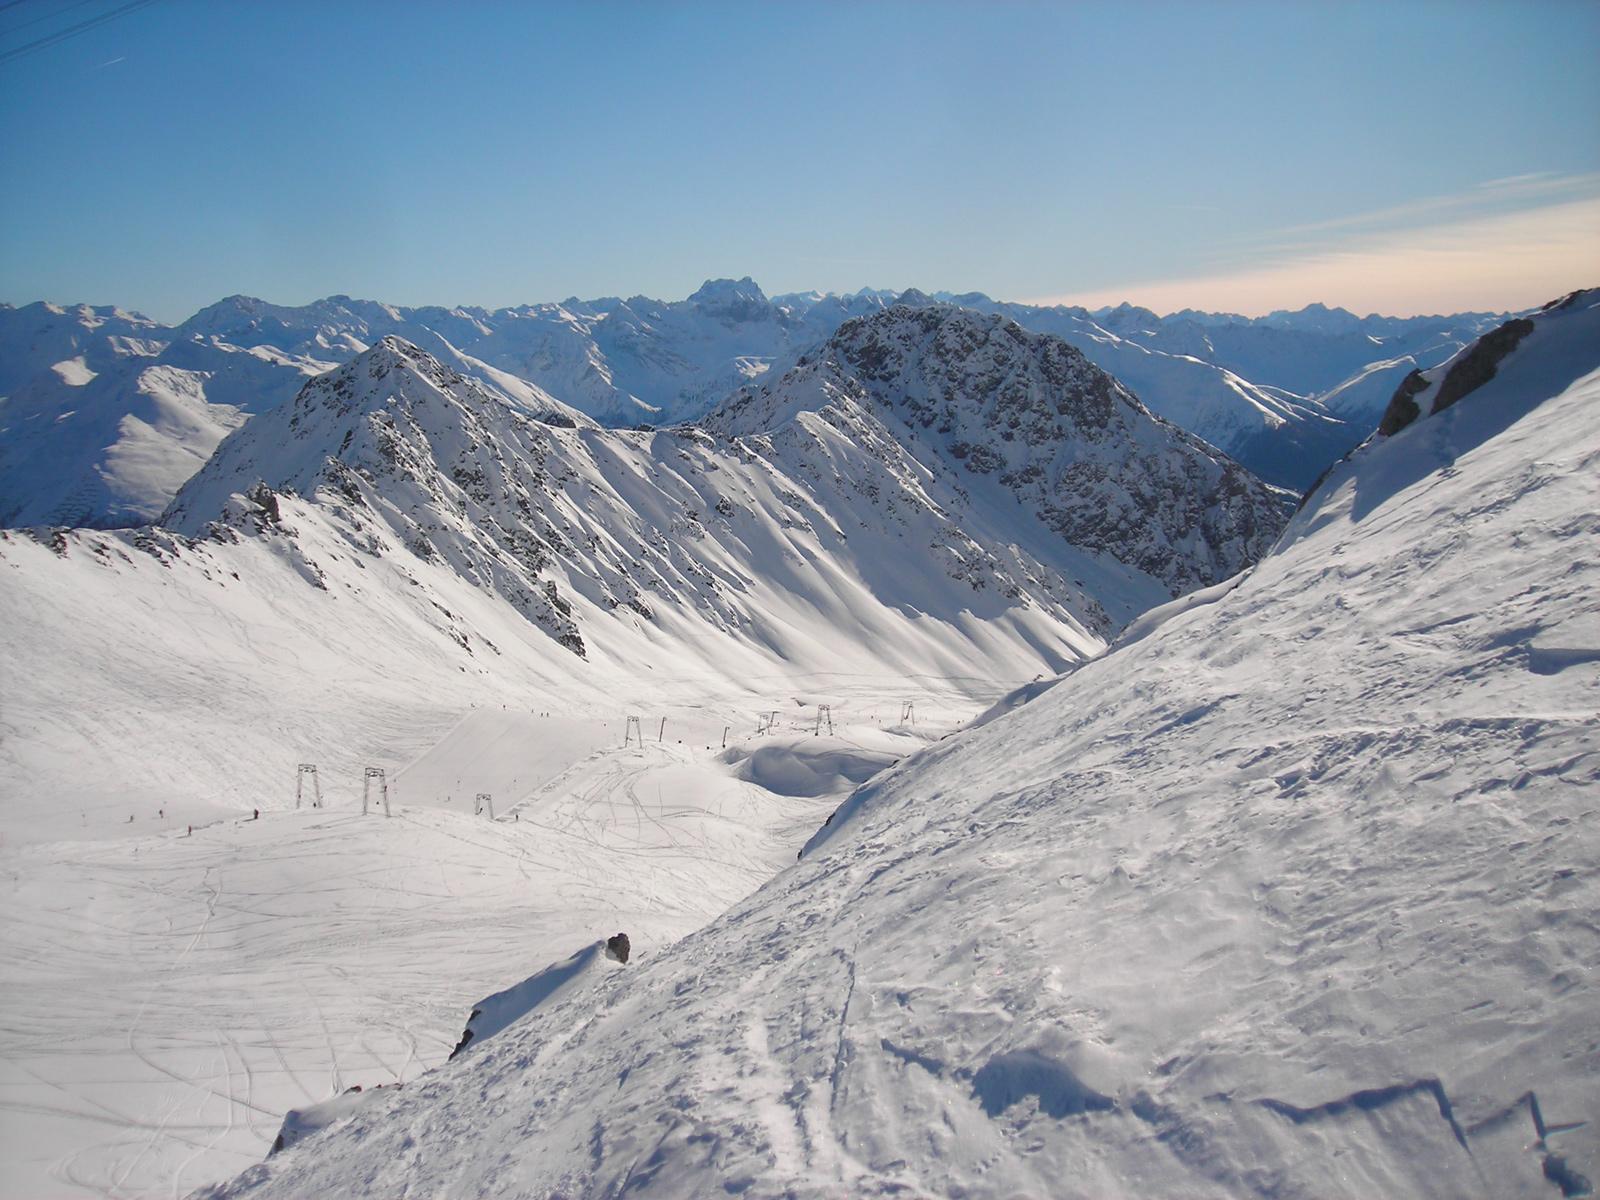 Fotogallery Davos